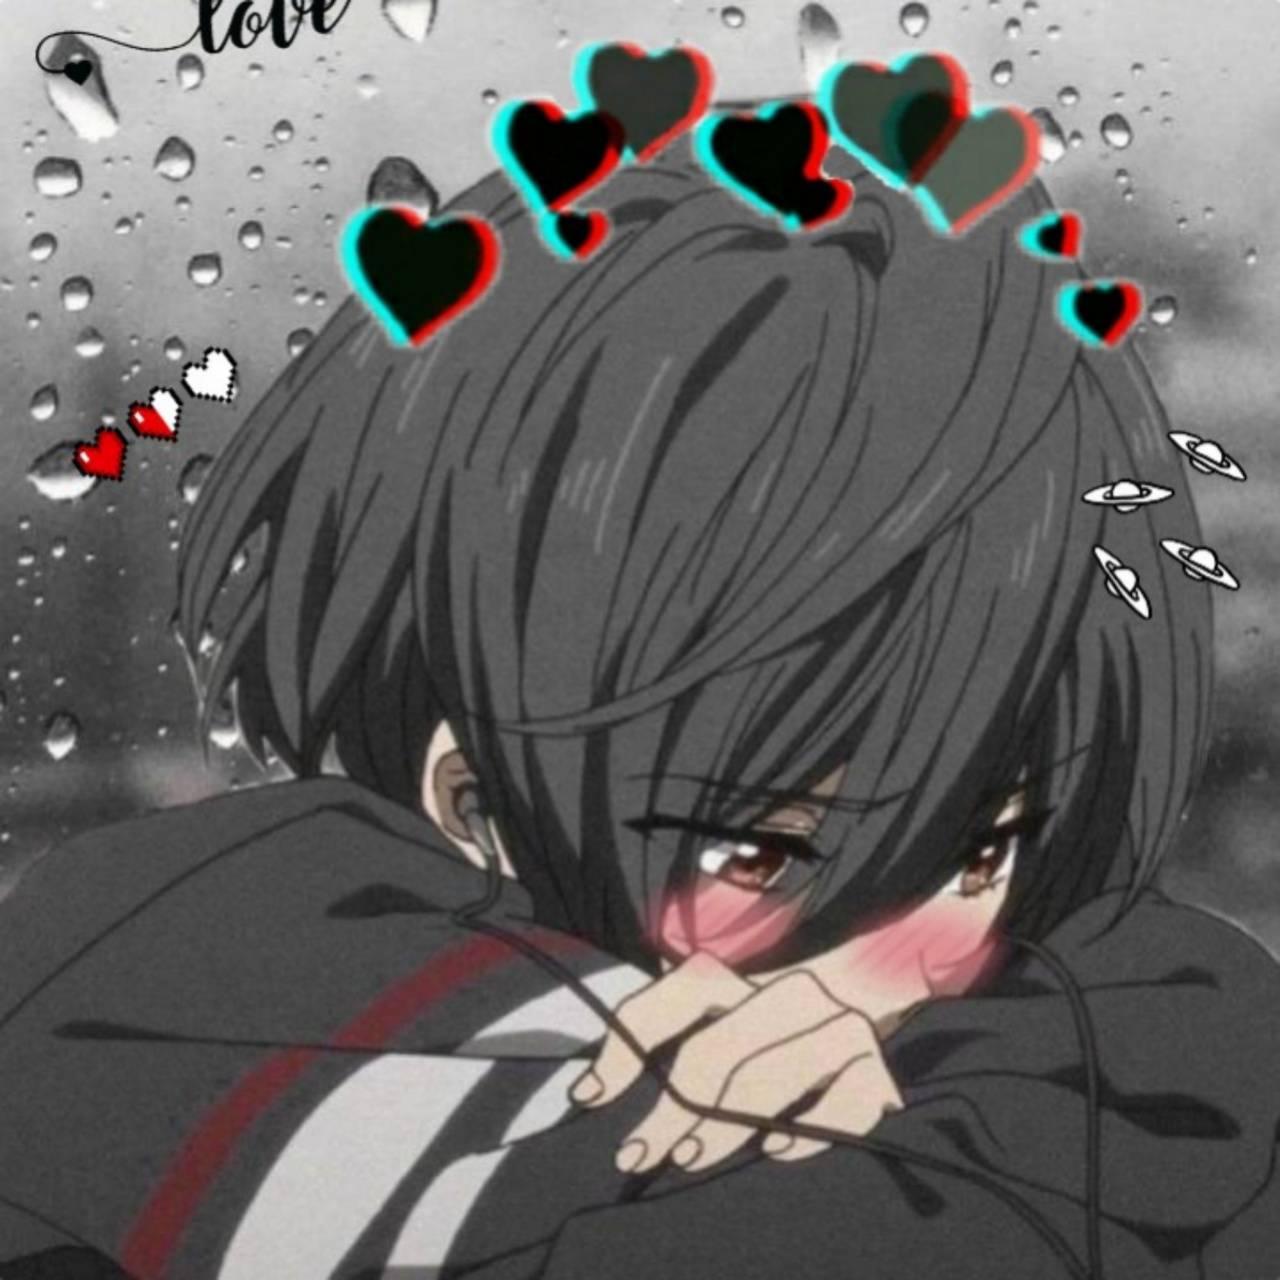 Sad anime wallpaper by LonelyAnime - 3c - Free on ZEDGE™